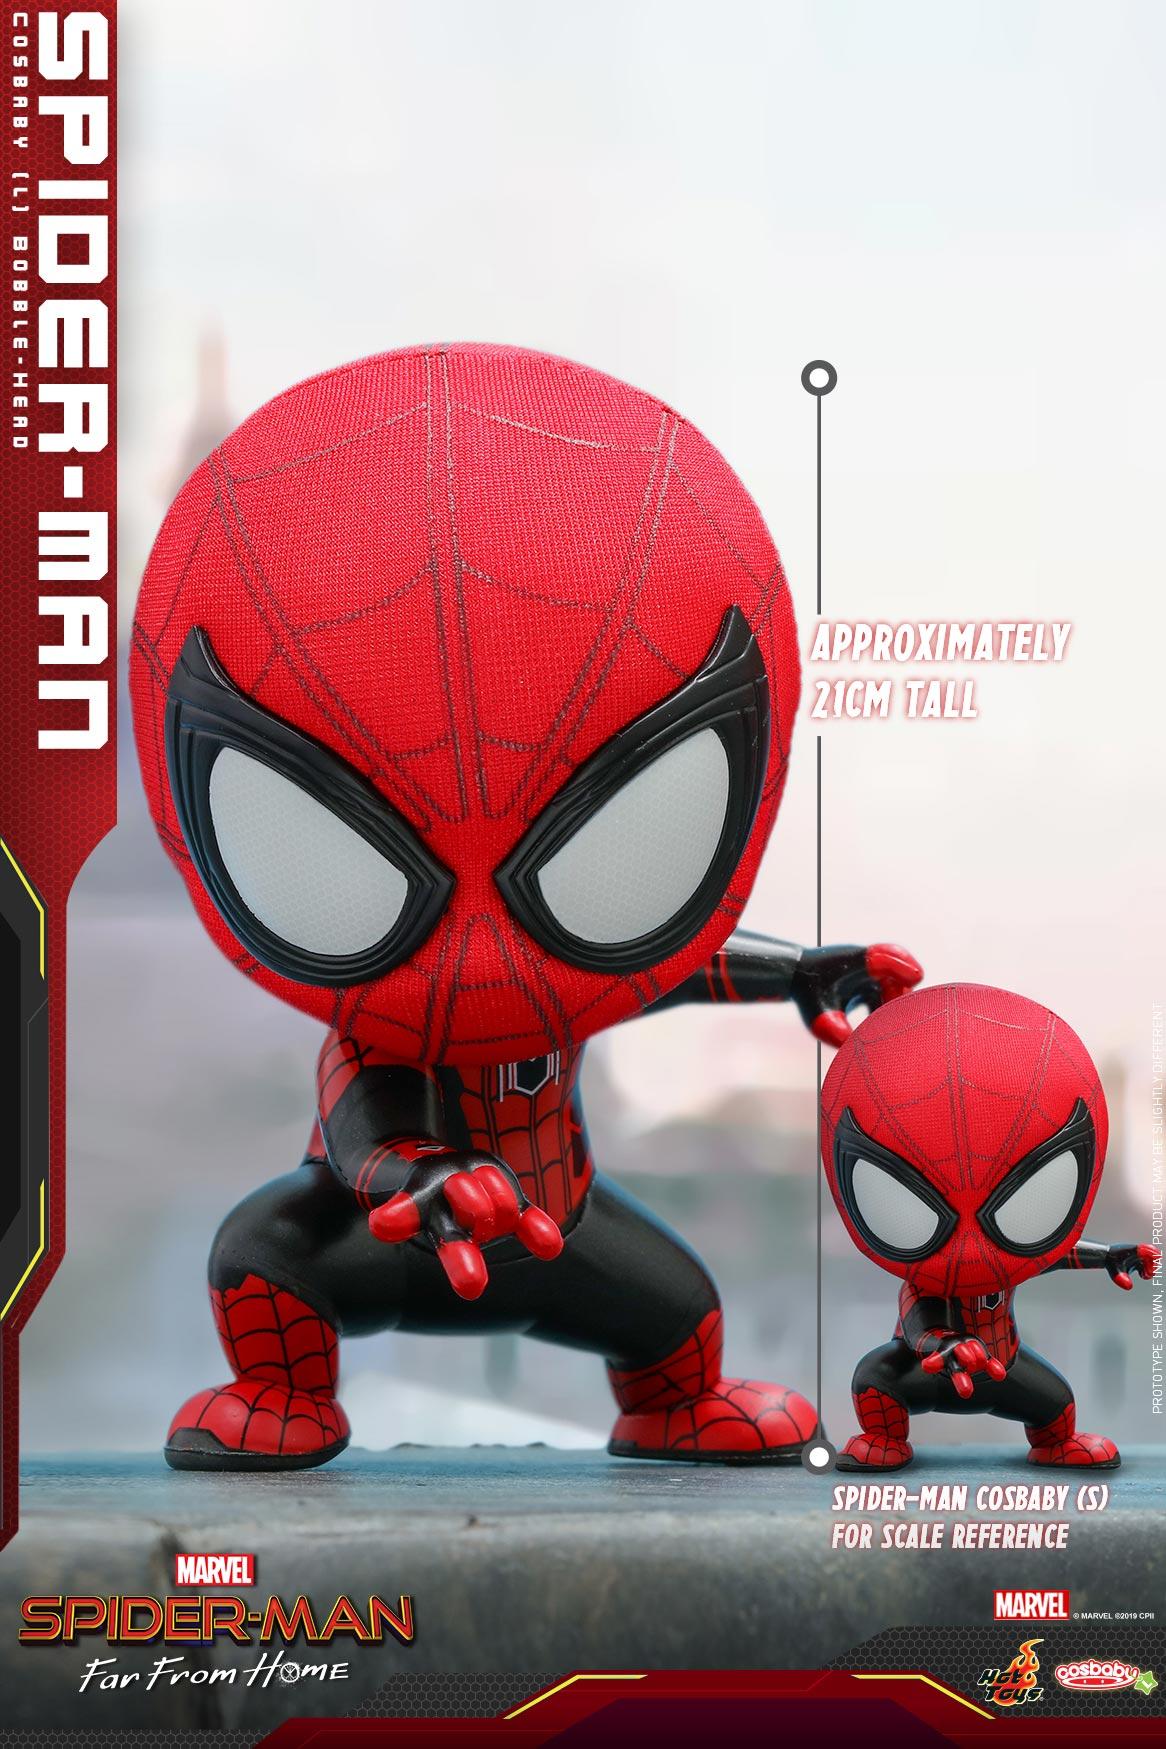 Hot-Toys---SMFFH---Spider-Man-Cosbaby-(L)_PR1